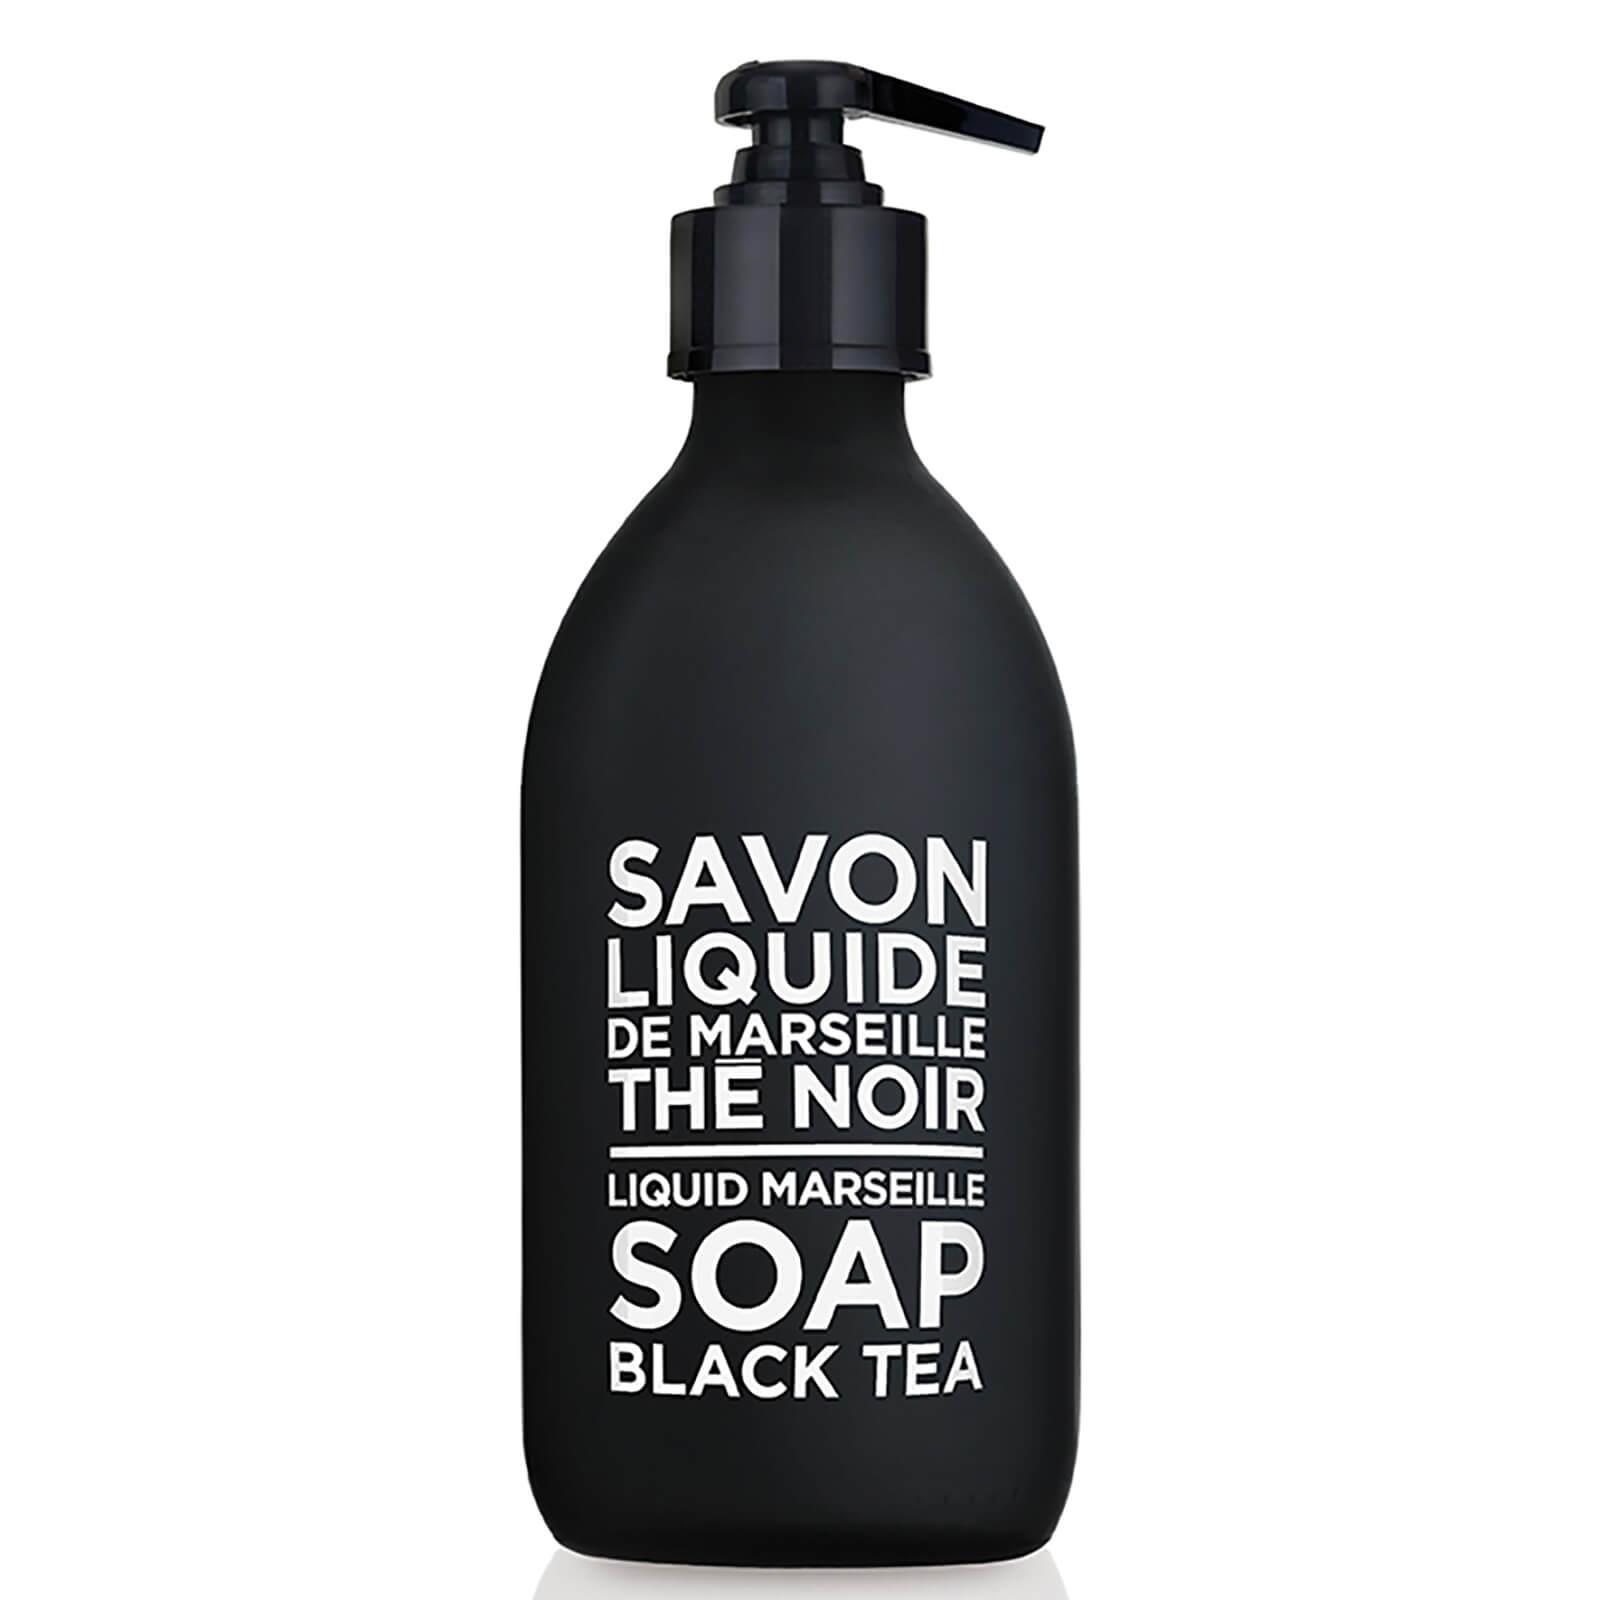 Купить Compagnie de Provence Liquid Marseille Soap 300ml (Various Options) - Black Tea